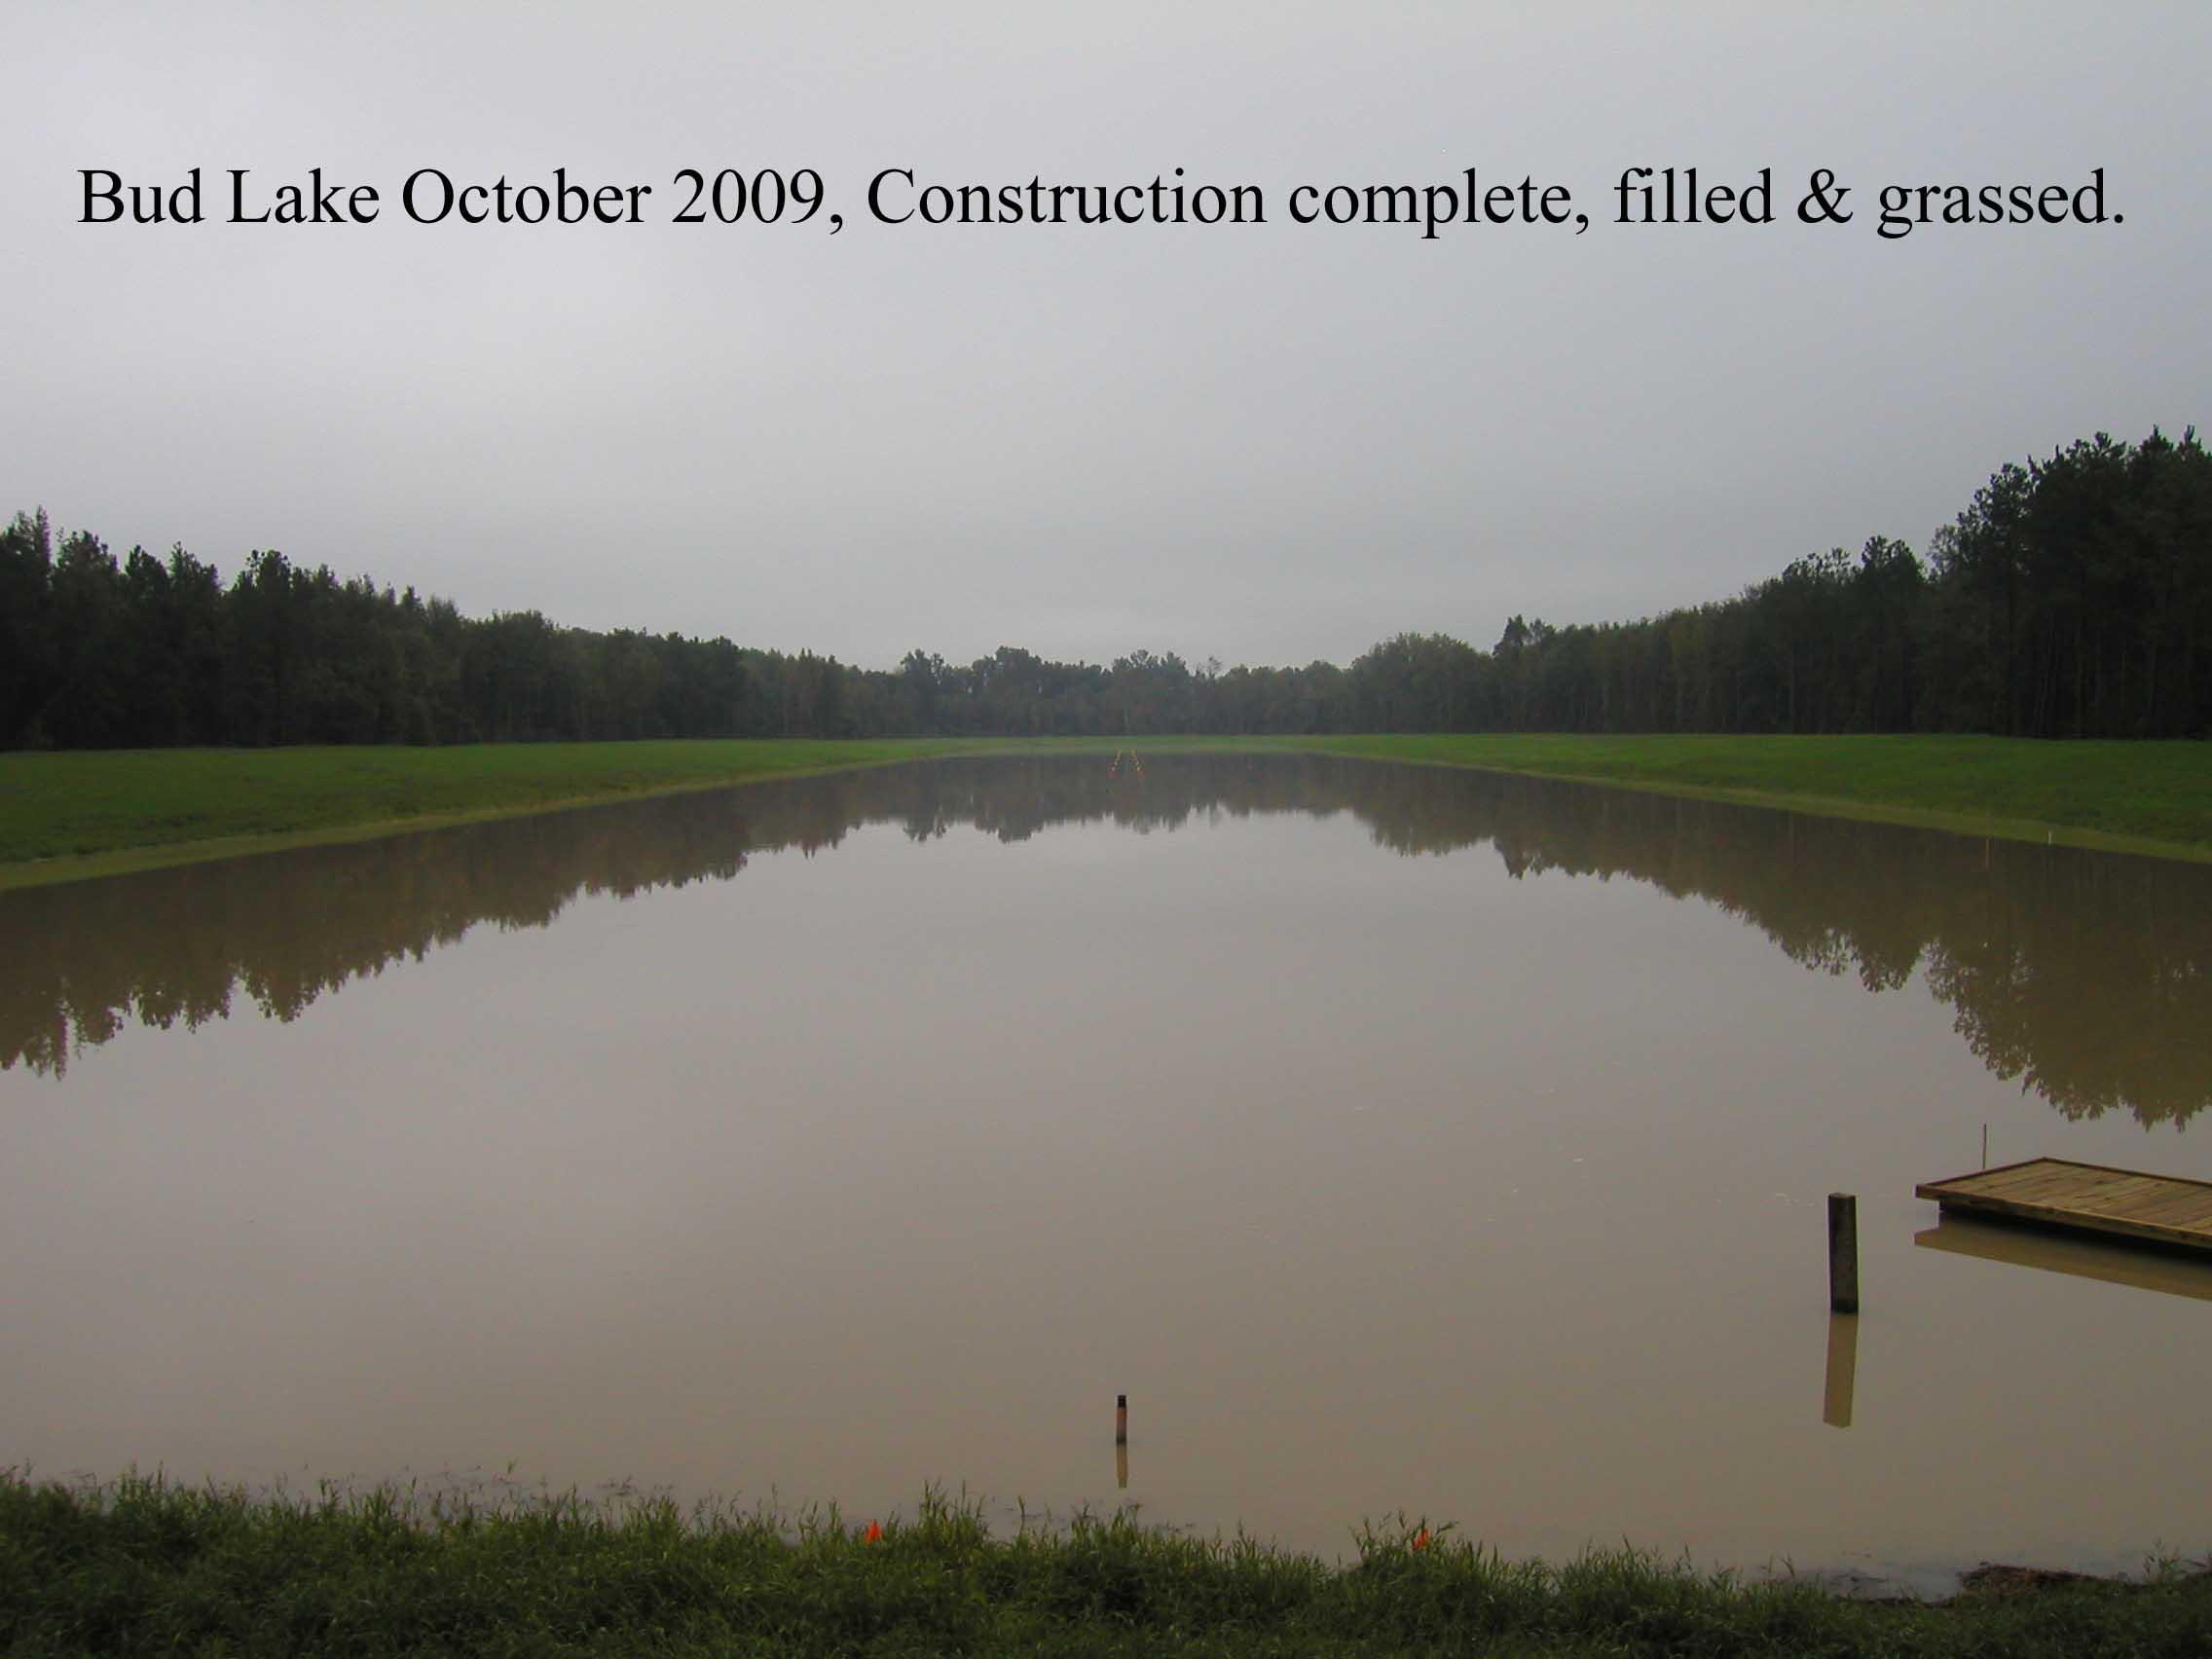 http://www.proskicoach.com/forum/uploads/6212_bud_lake.jpg